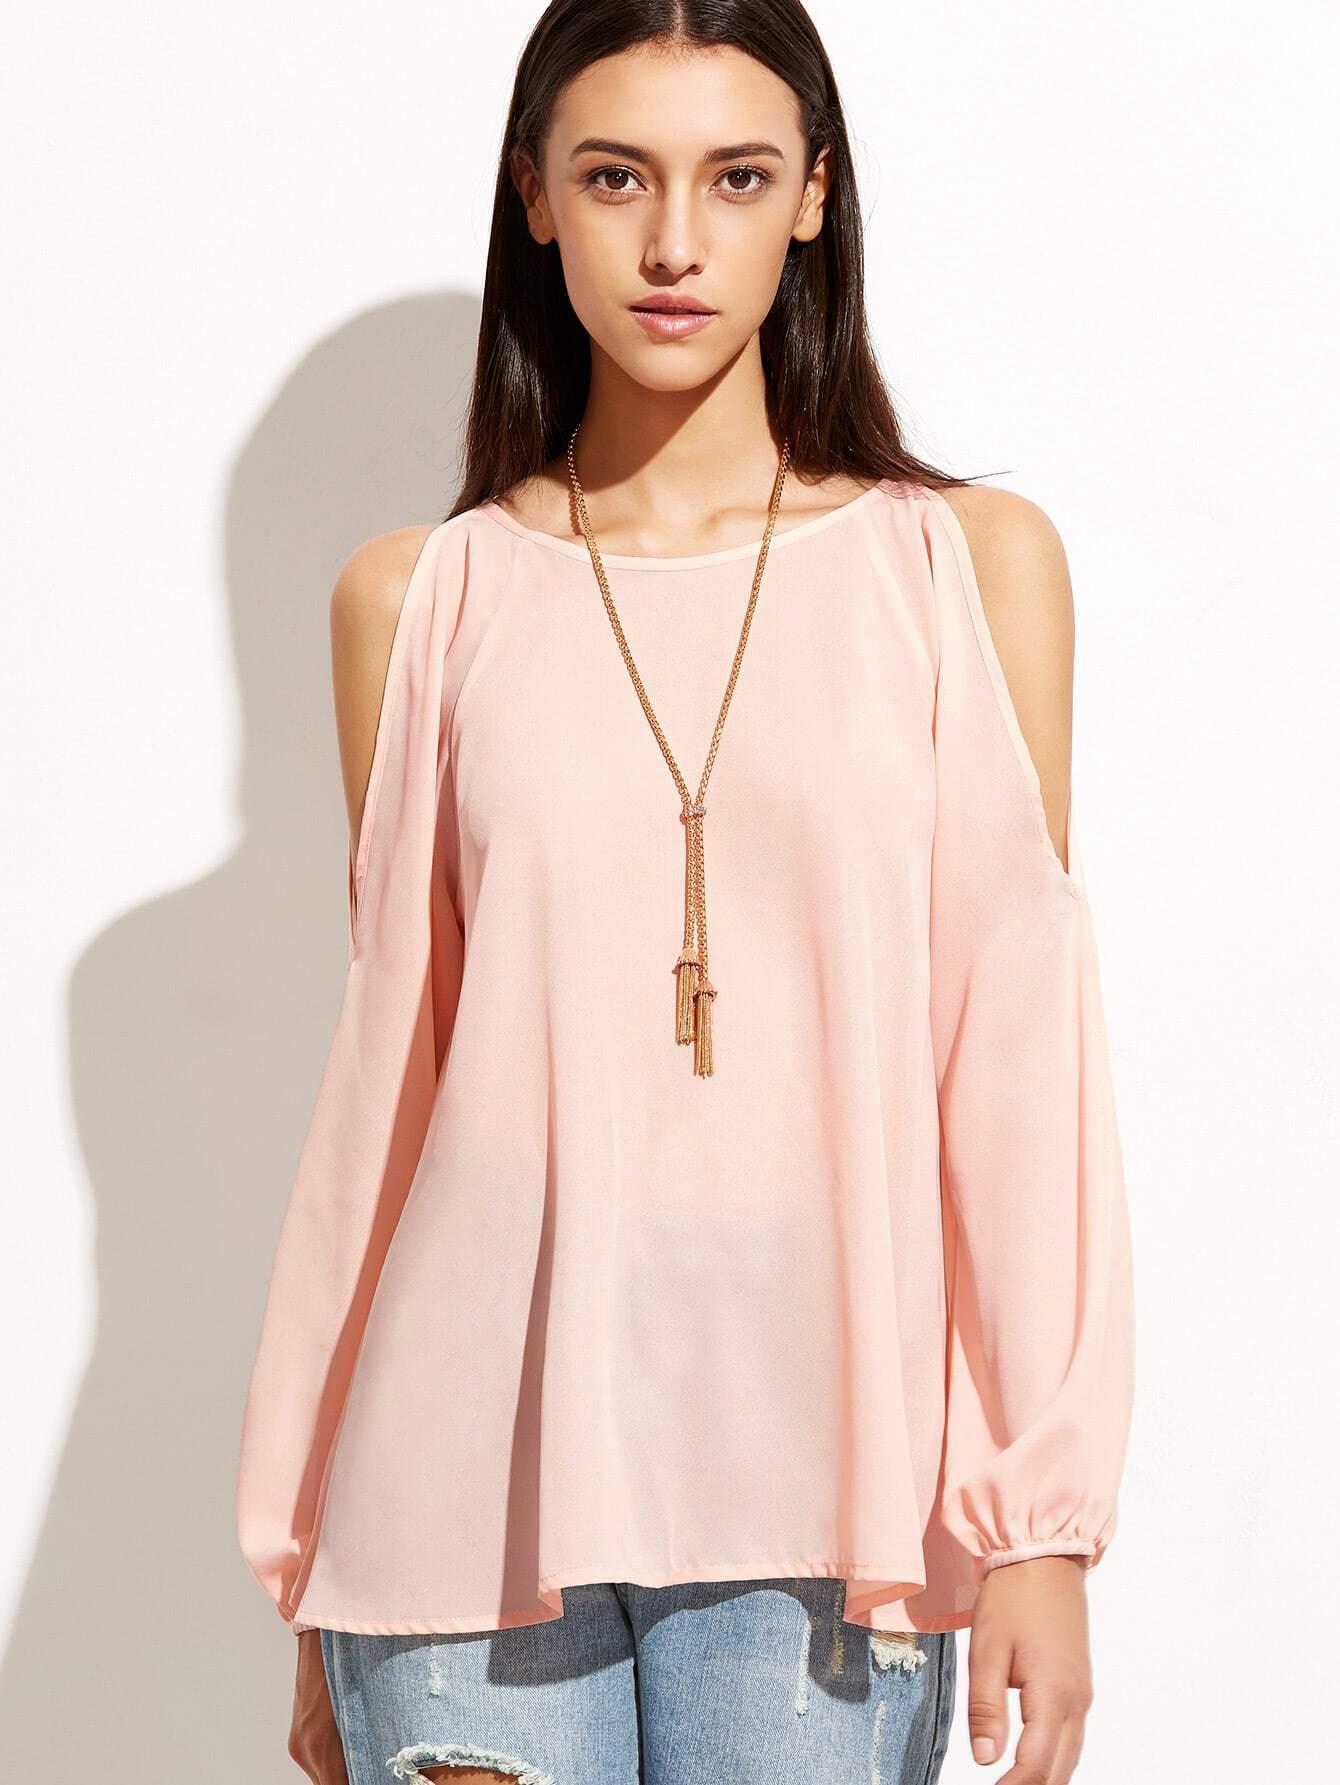 blouse160923708_2